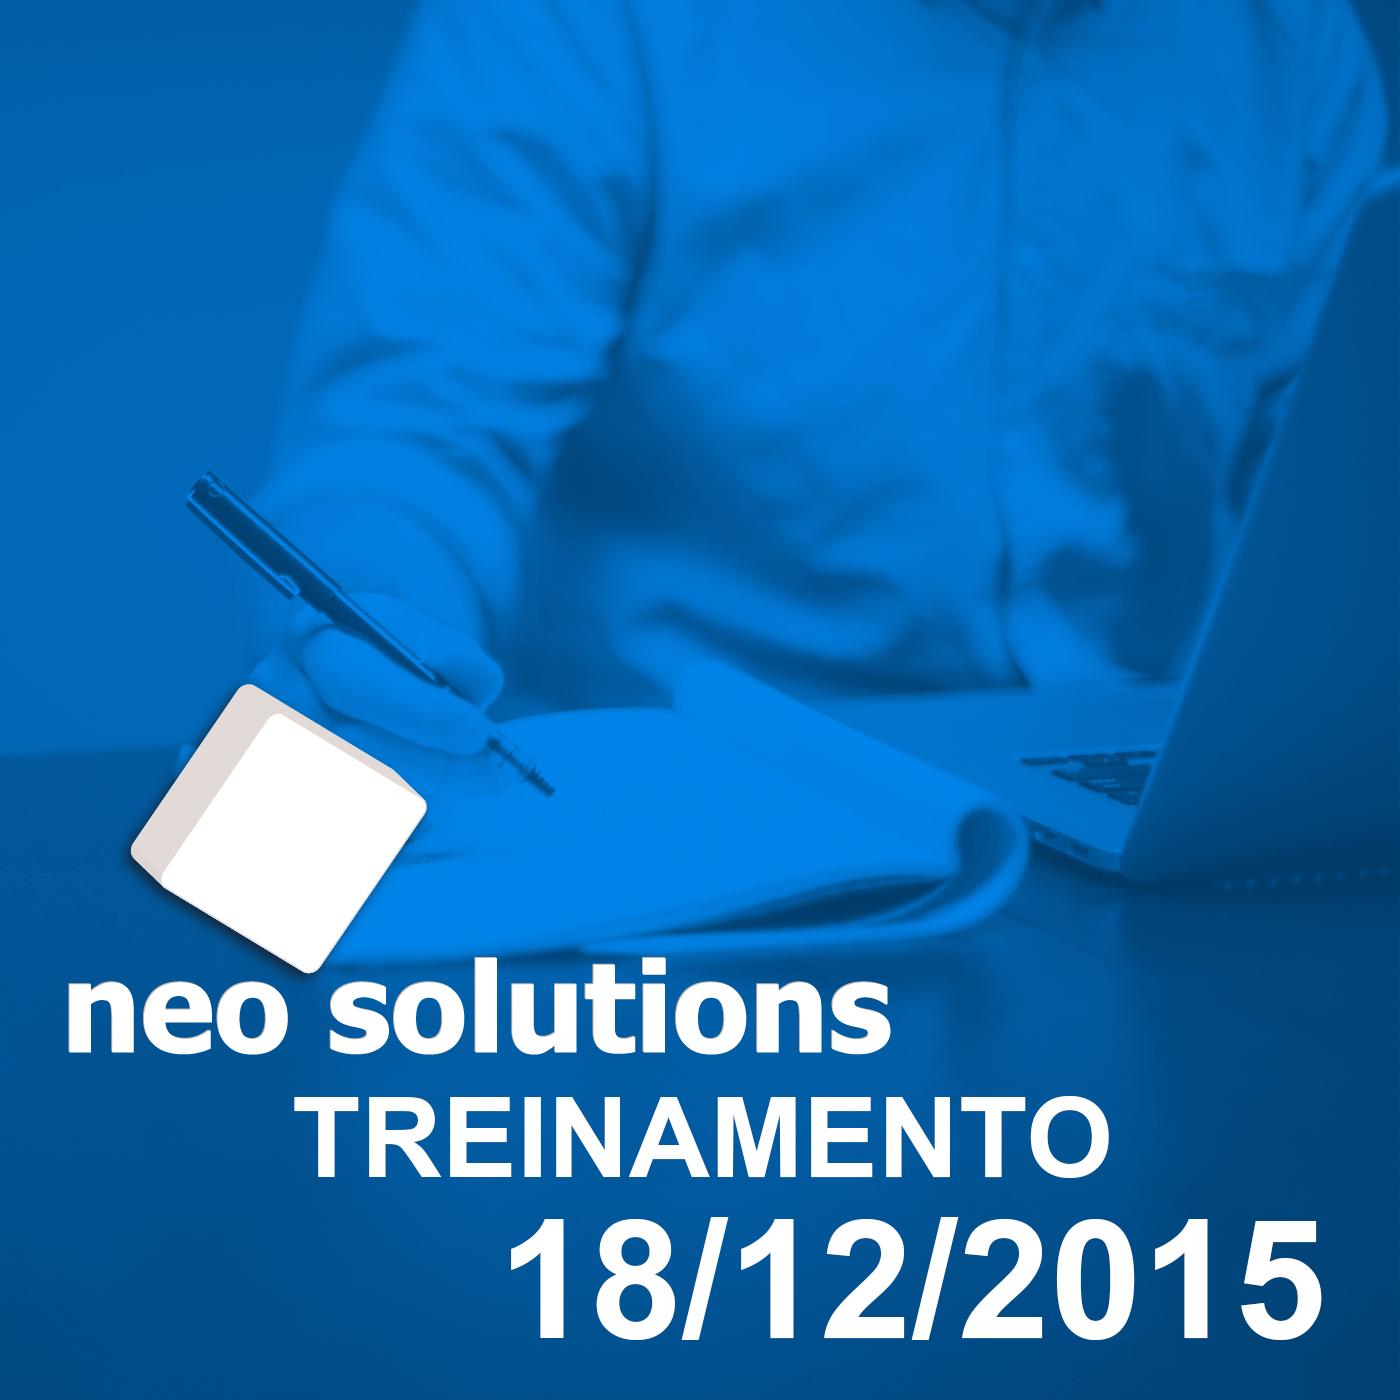 Teinamento Neo Solutions